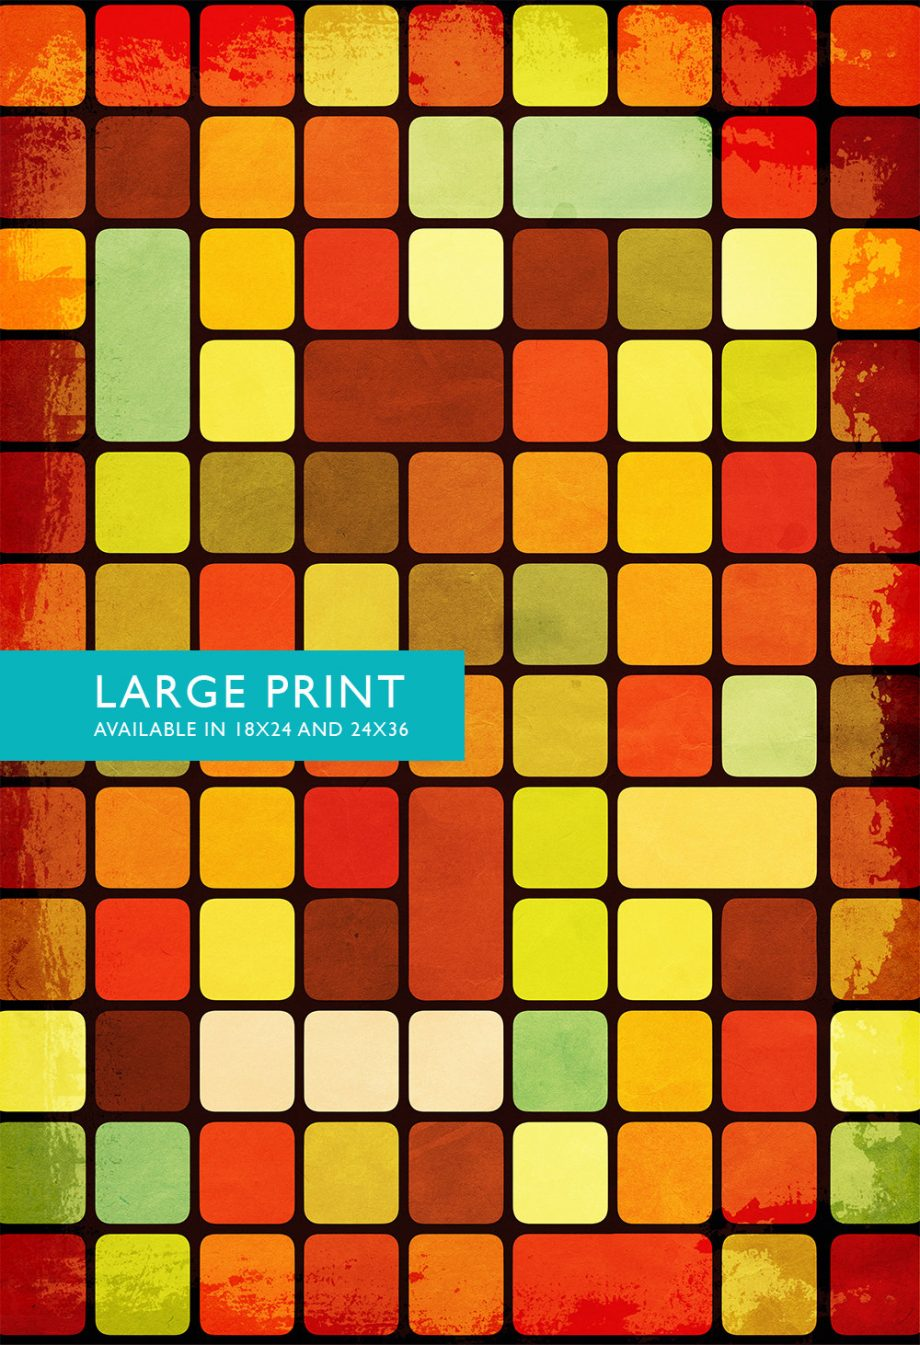 Mid Century Modern Print Geometric Retro Square Vintage Retro Abstract Art Print Poster Giclee on Cotton Canvas & Satin